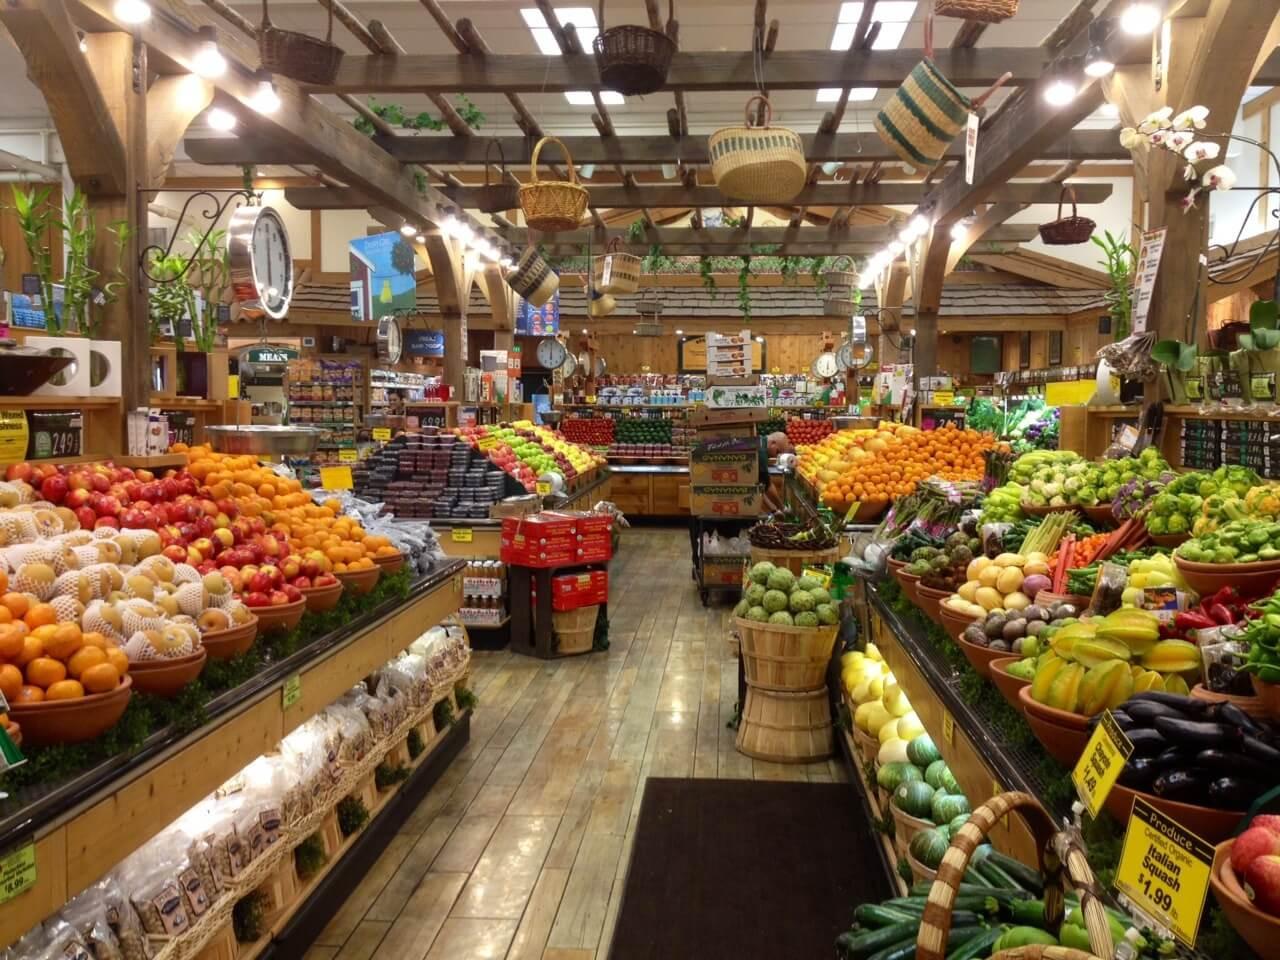 Healthy Supermarket Snacks  Most Unhealthy Foods in Healthy Food Stores